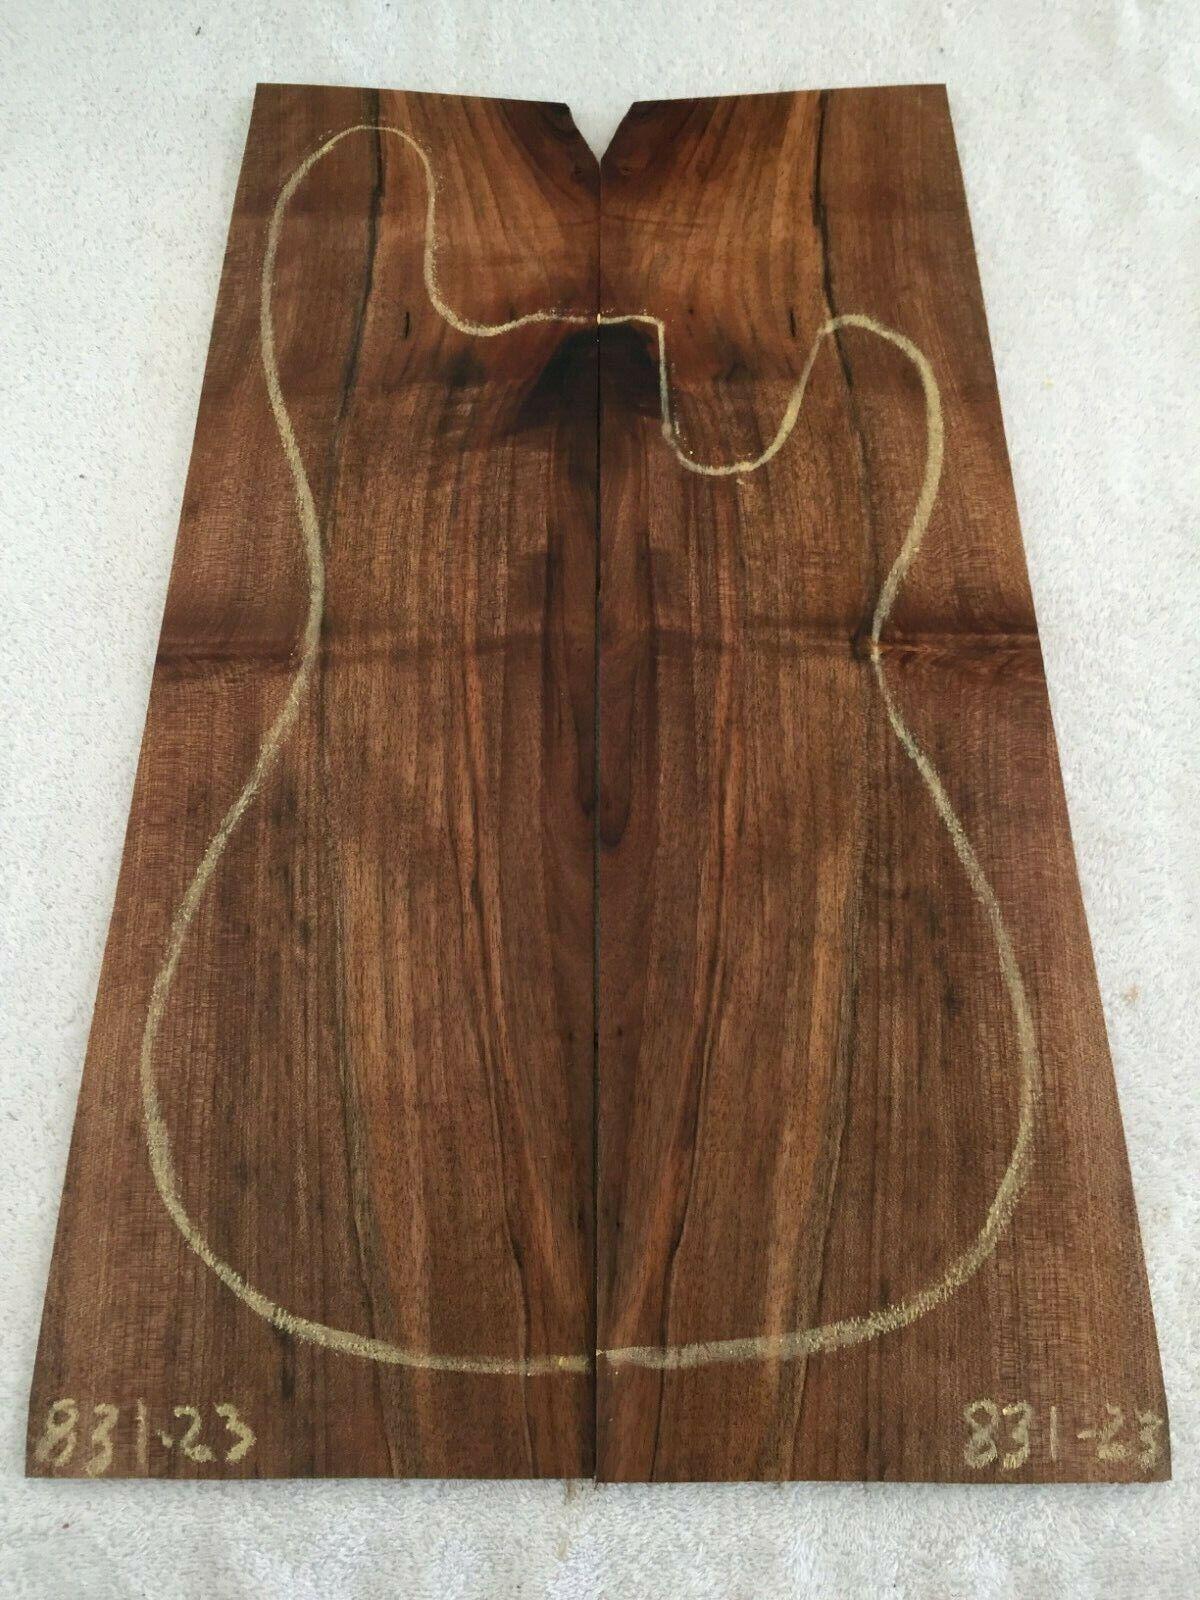 English Walnut book match set guitar tone wood .29 x 12.5 - 16 x 22.75    831-23